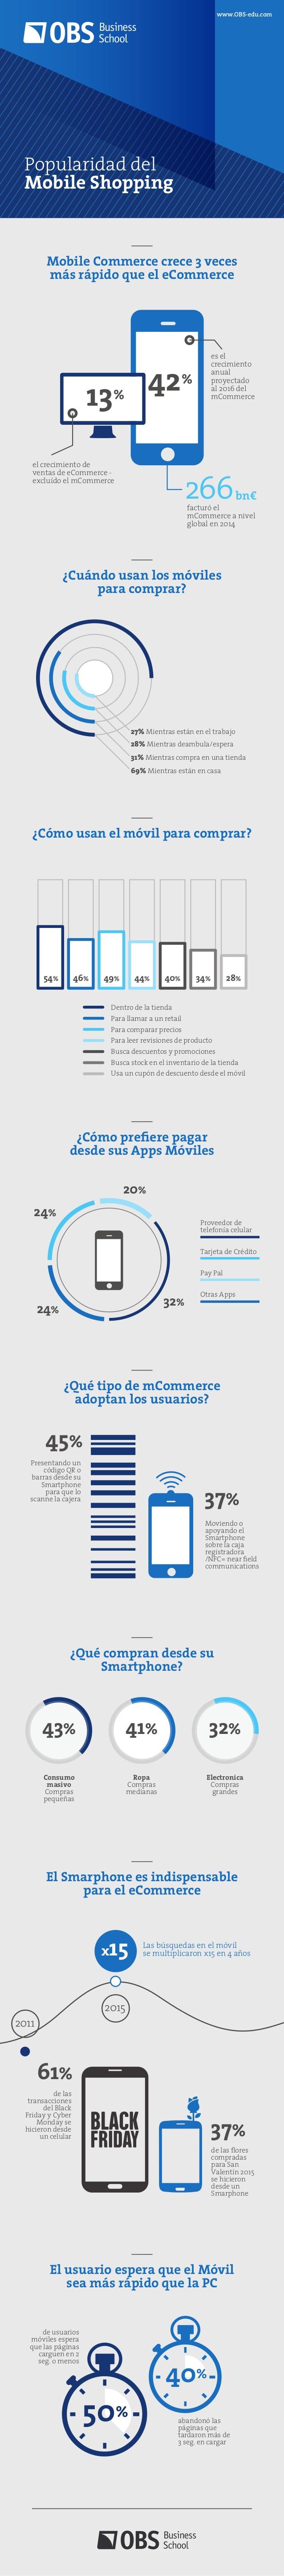 Popularidad del Mobile Commerce